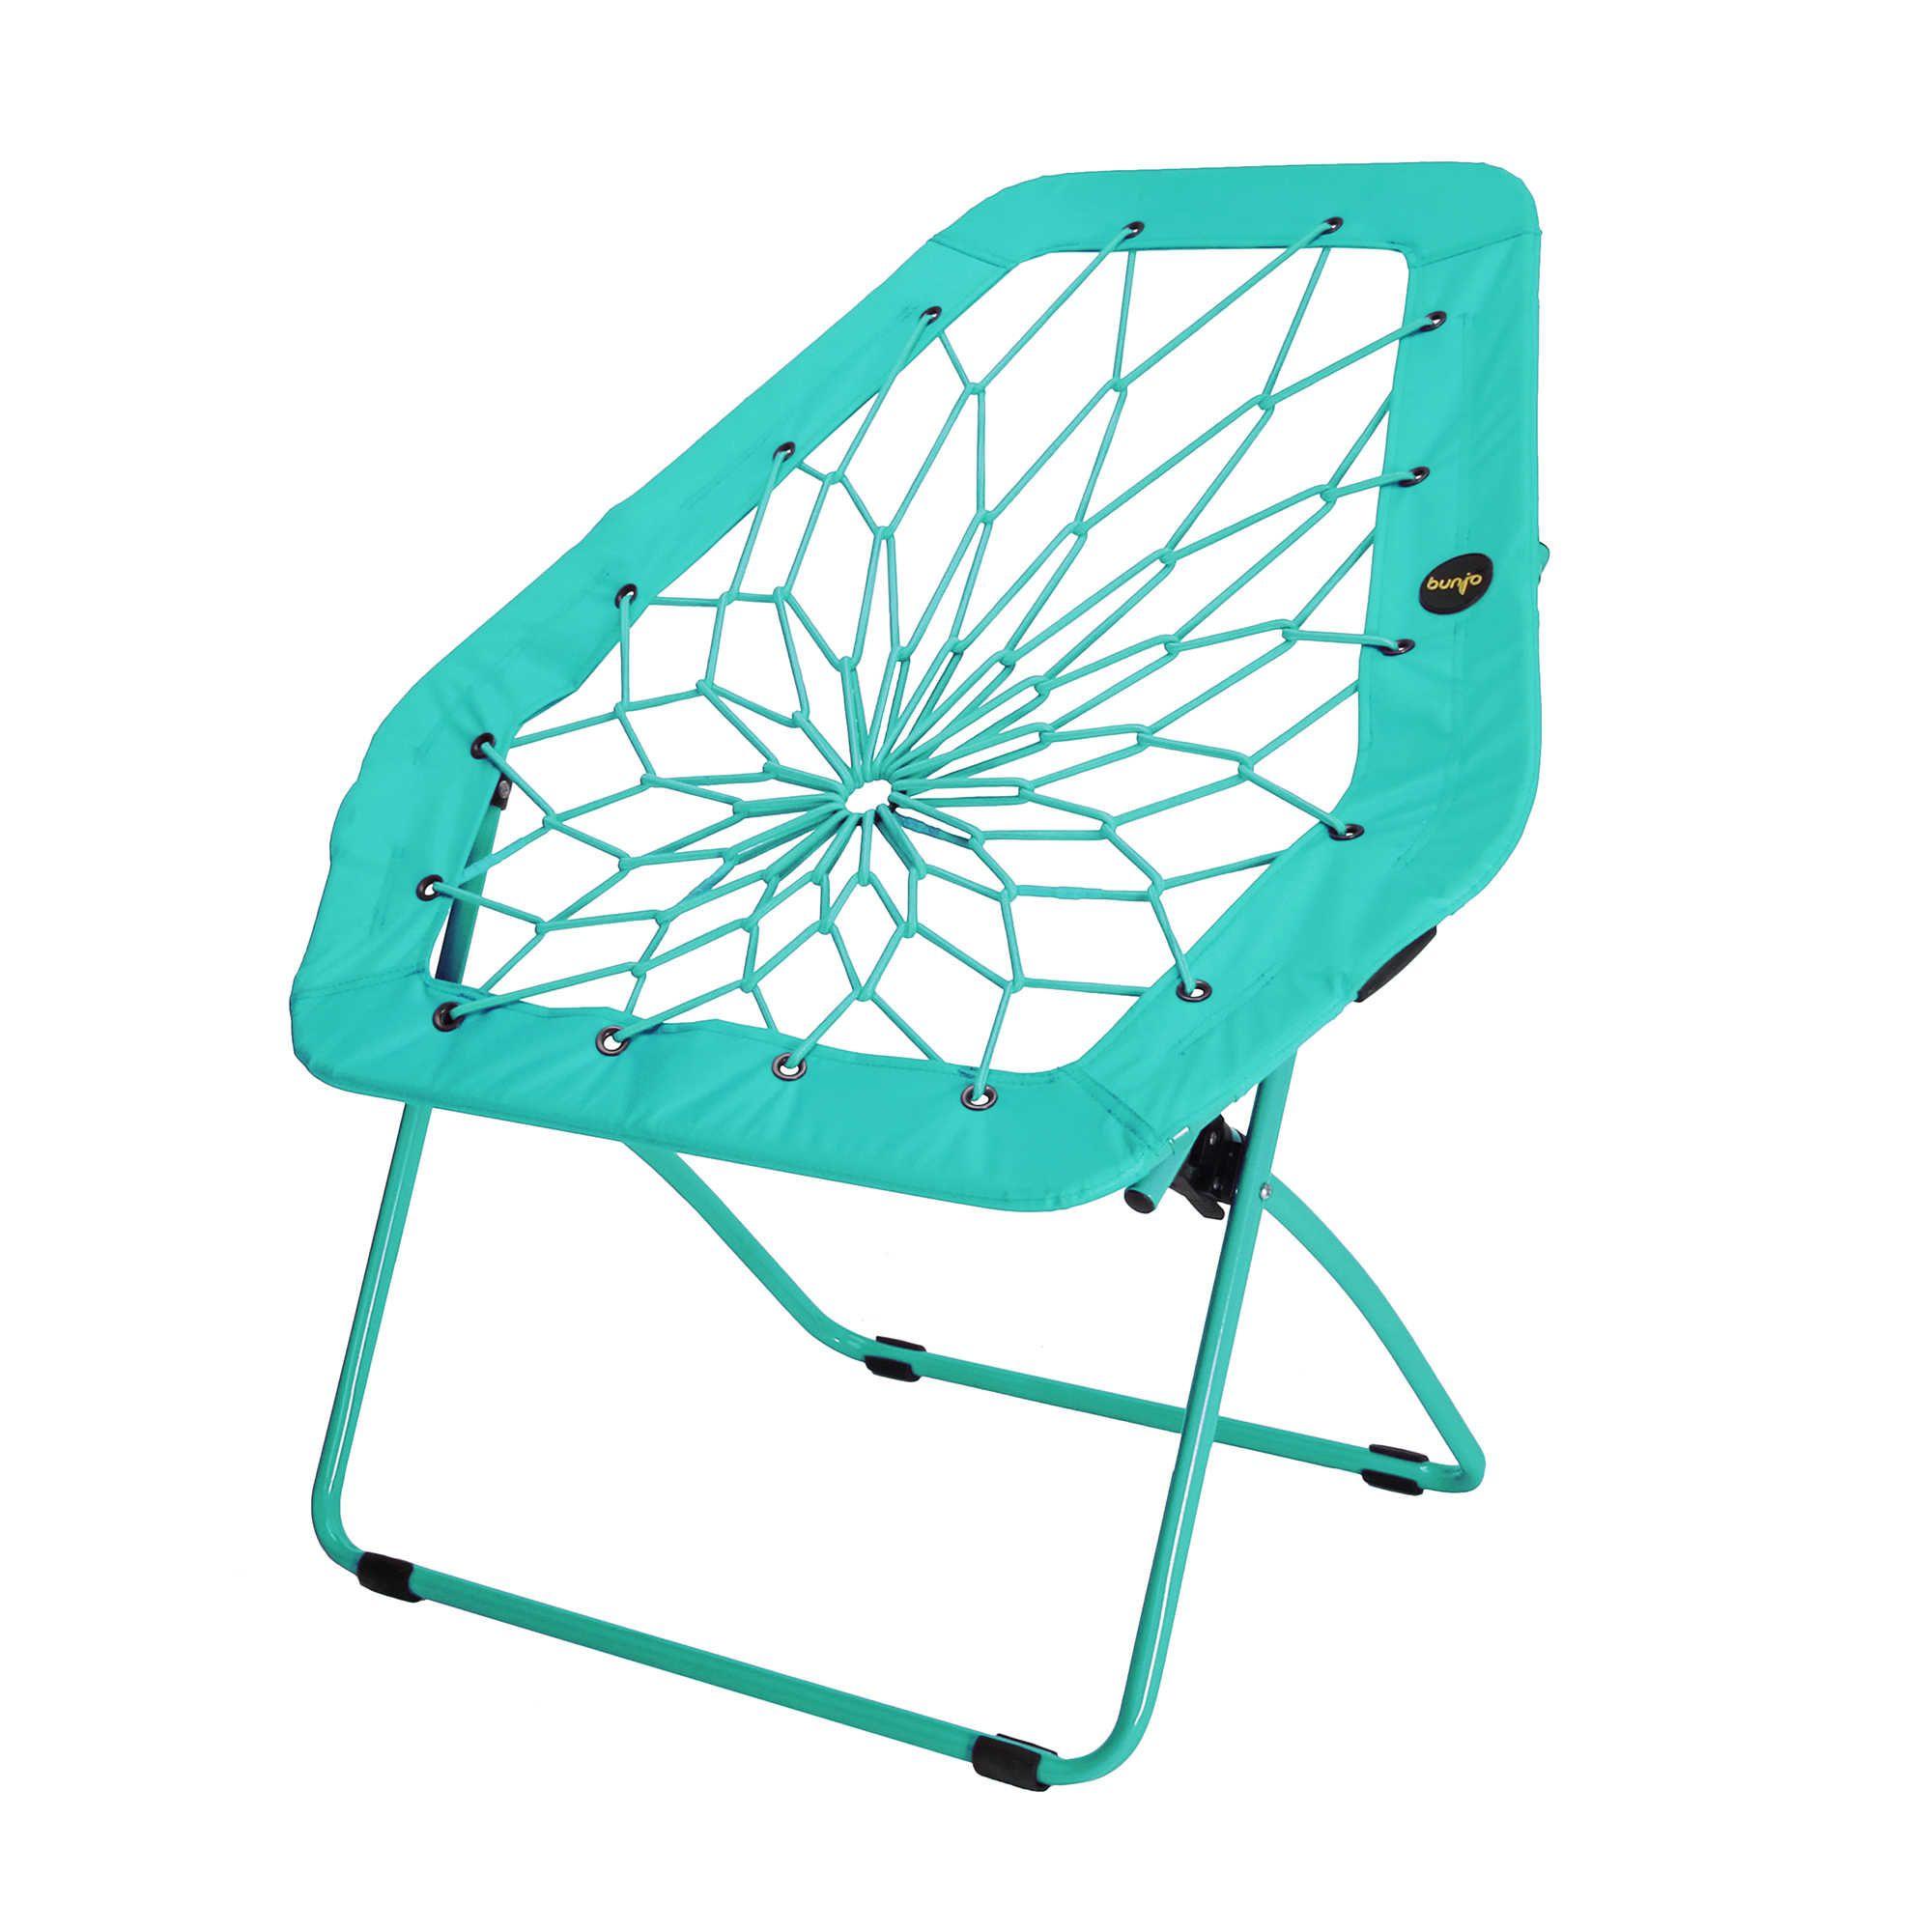 Bungee chair purple - Bunjo Hex Bungee Chair